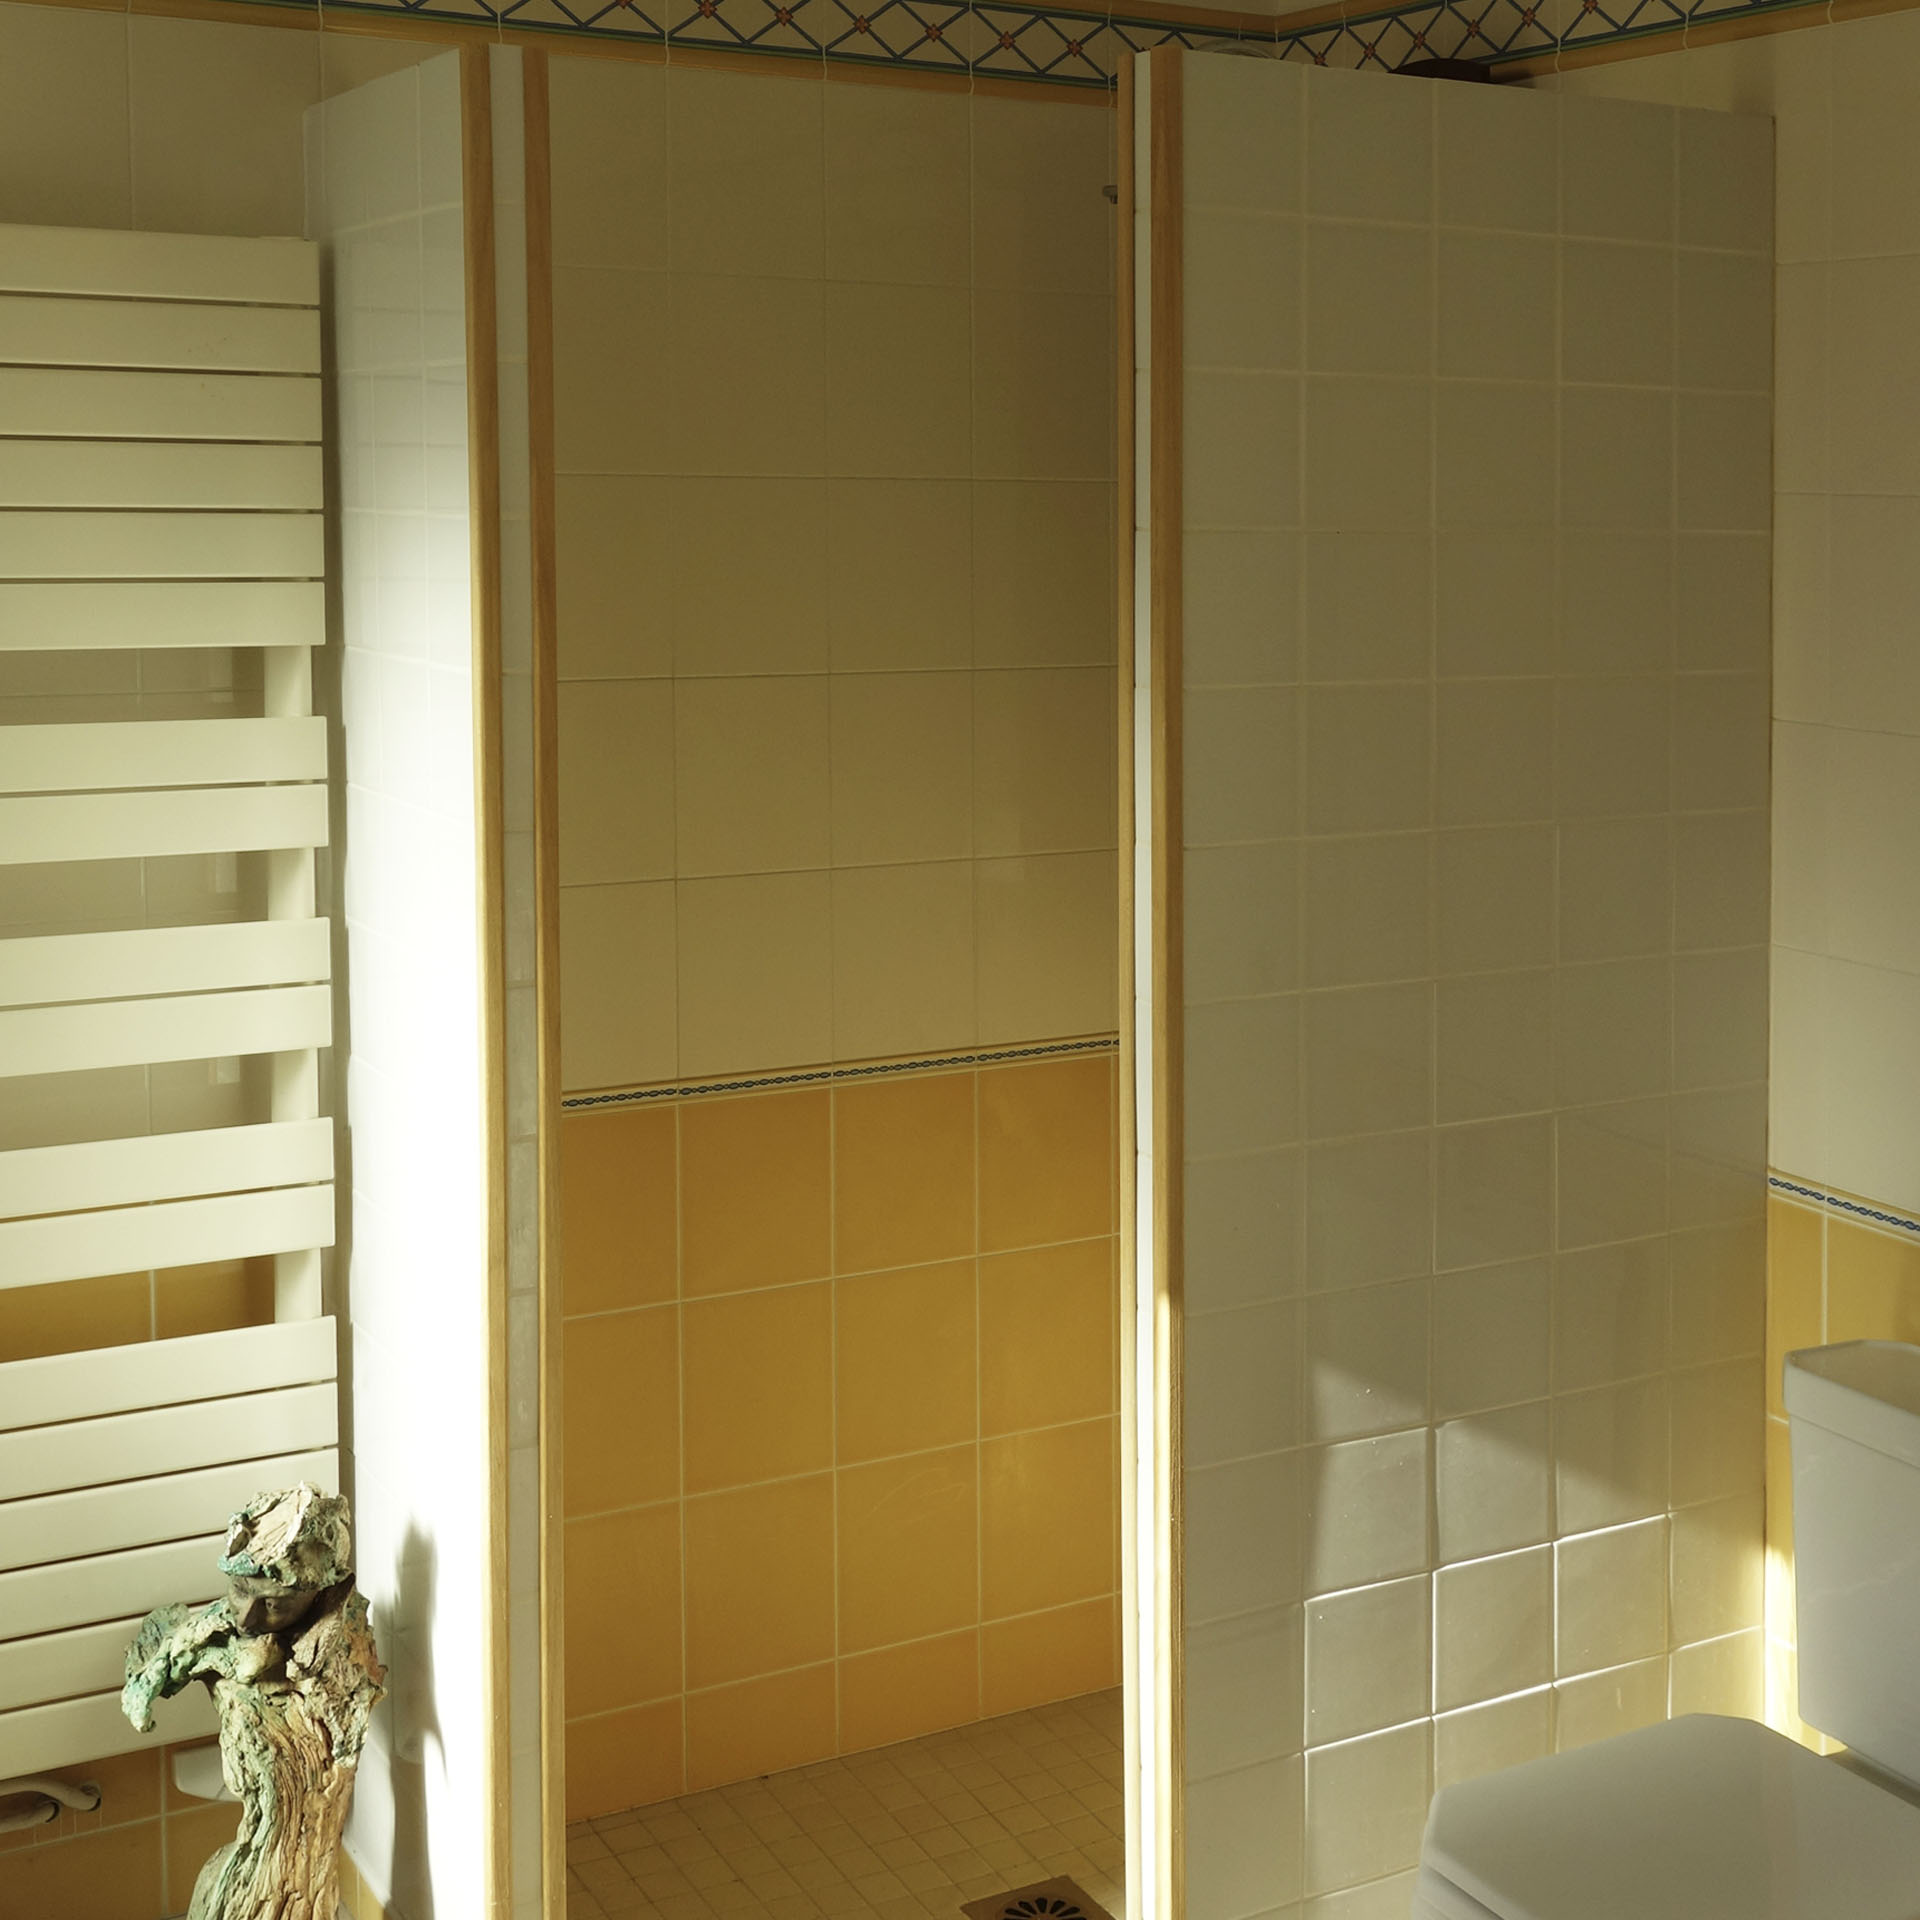 Salle de bain - Douche italienne - titren